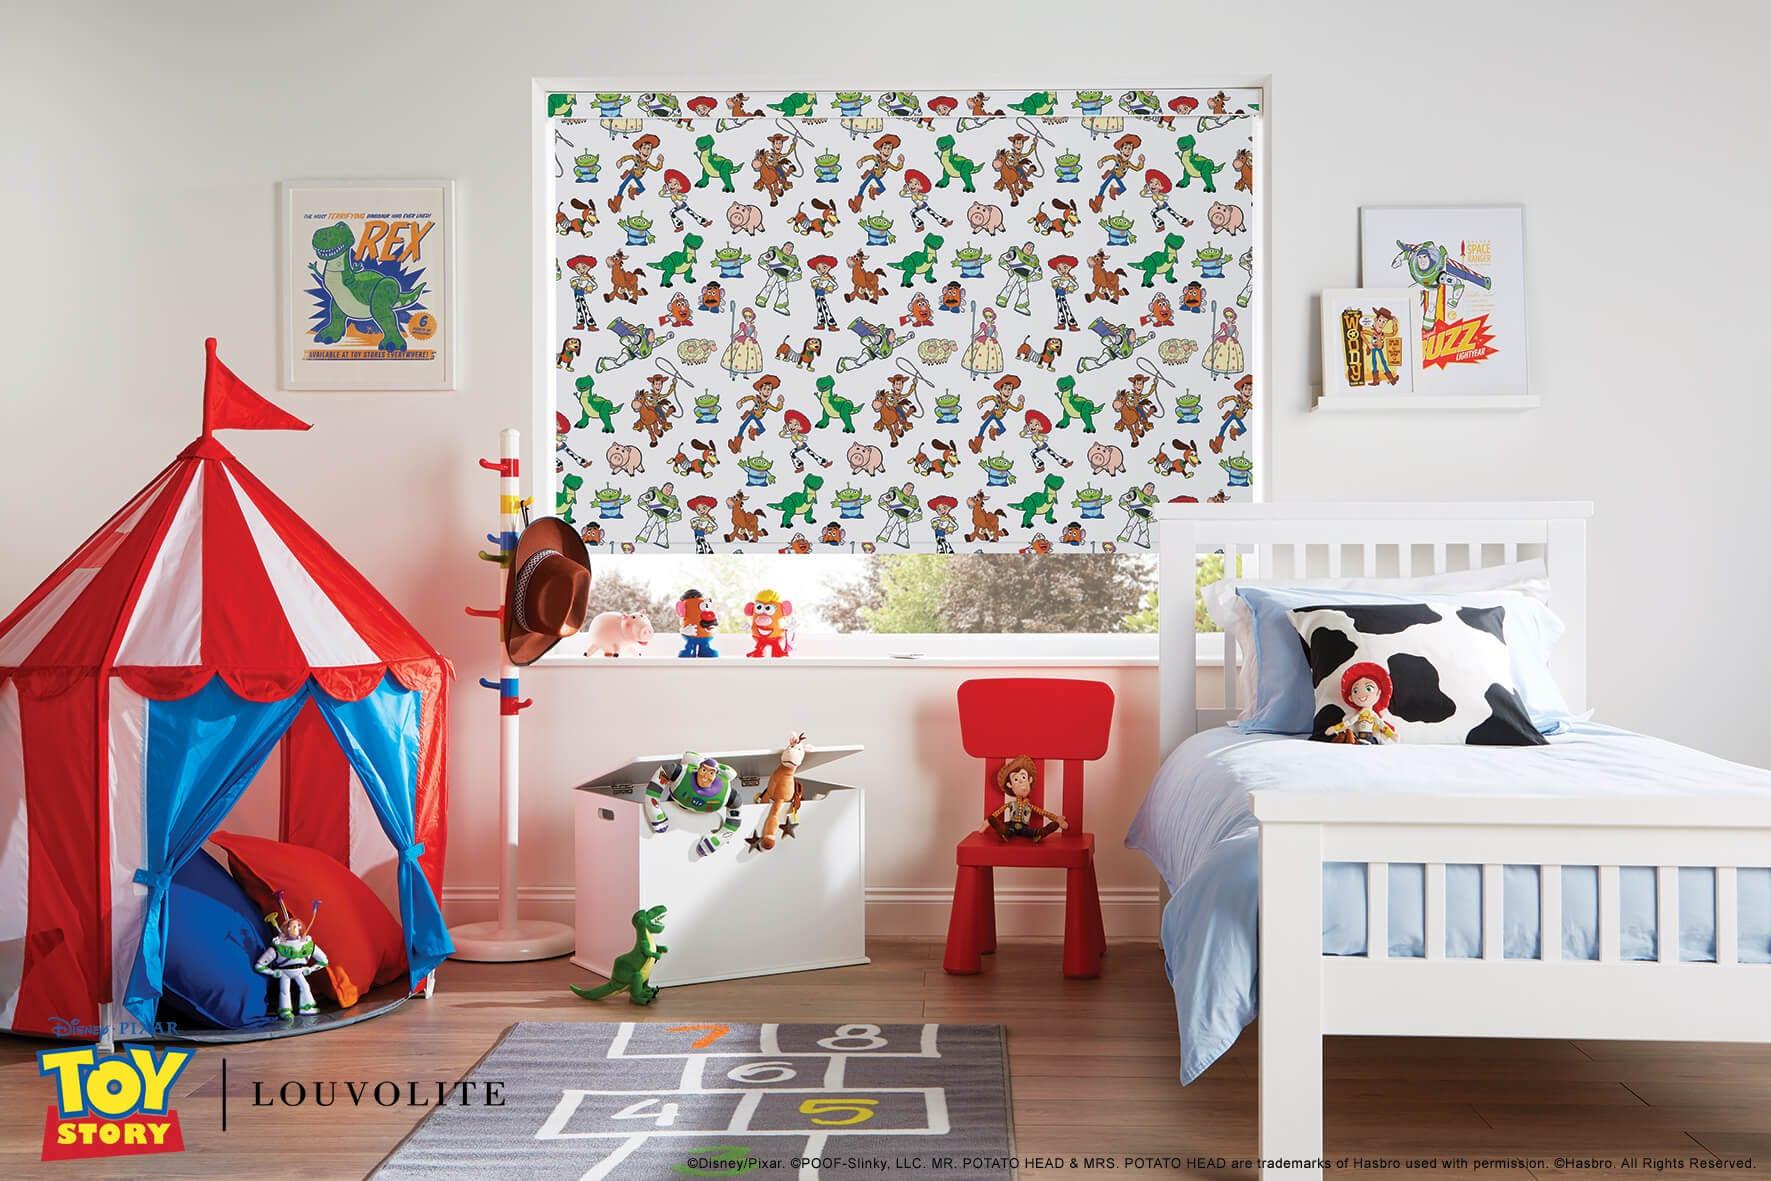 Disney Toy Story Roller blinds.